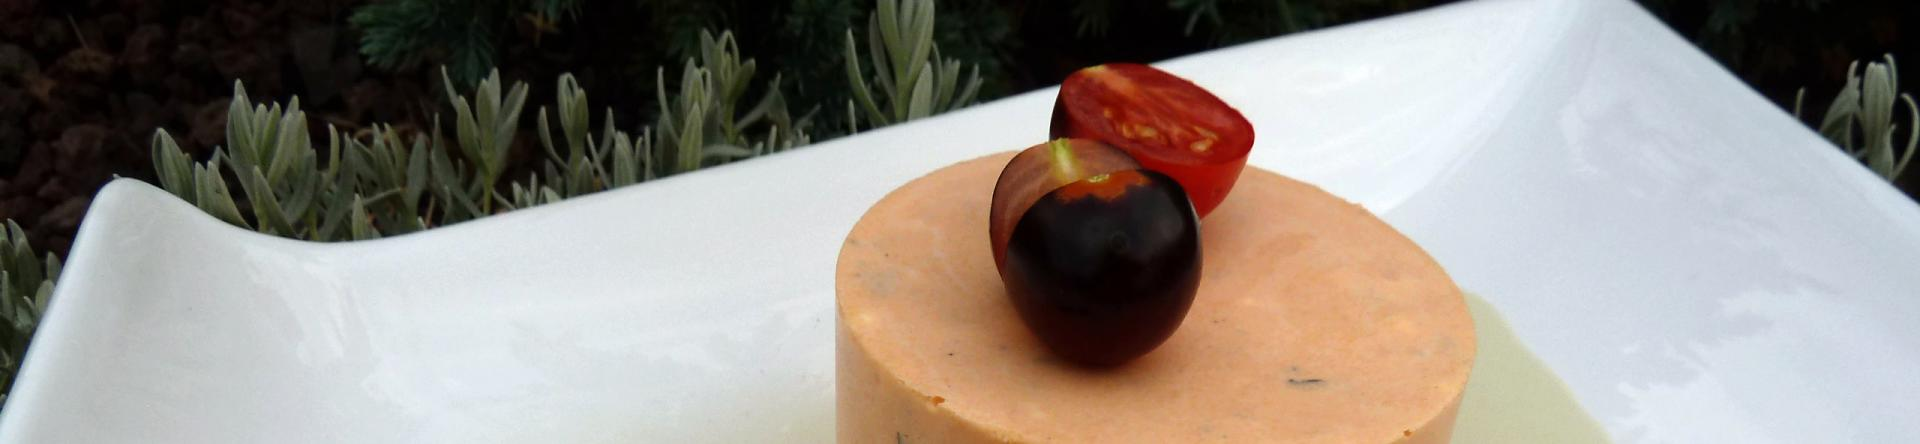 Bavarois tomates et basilic